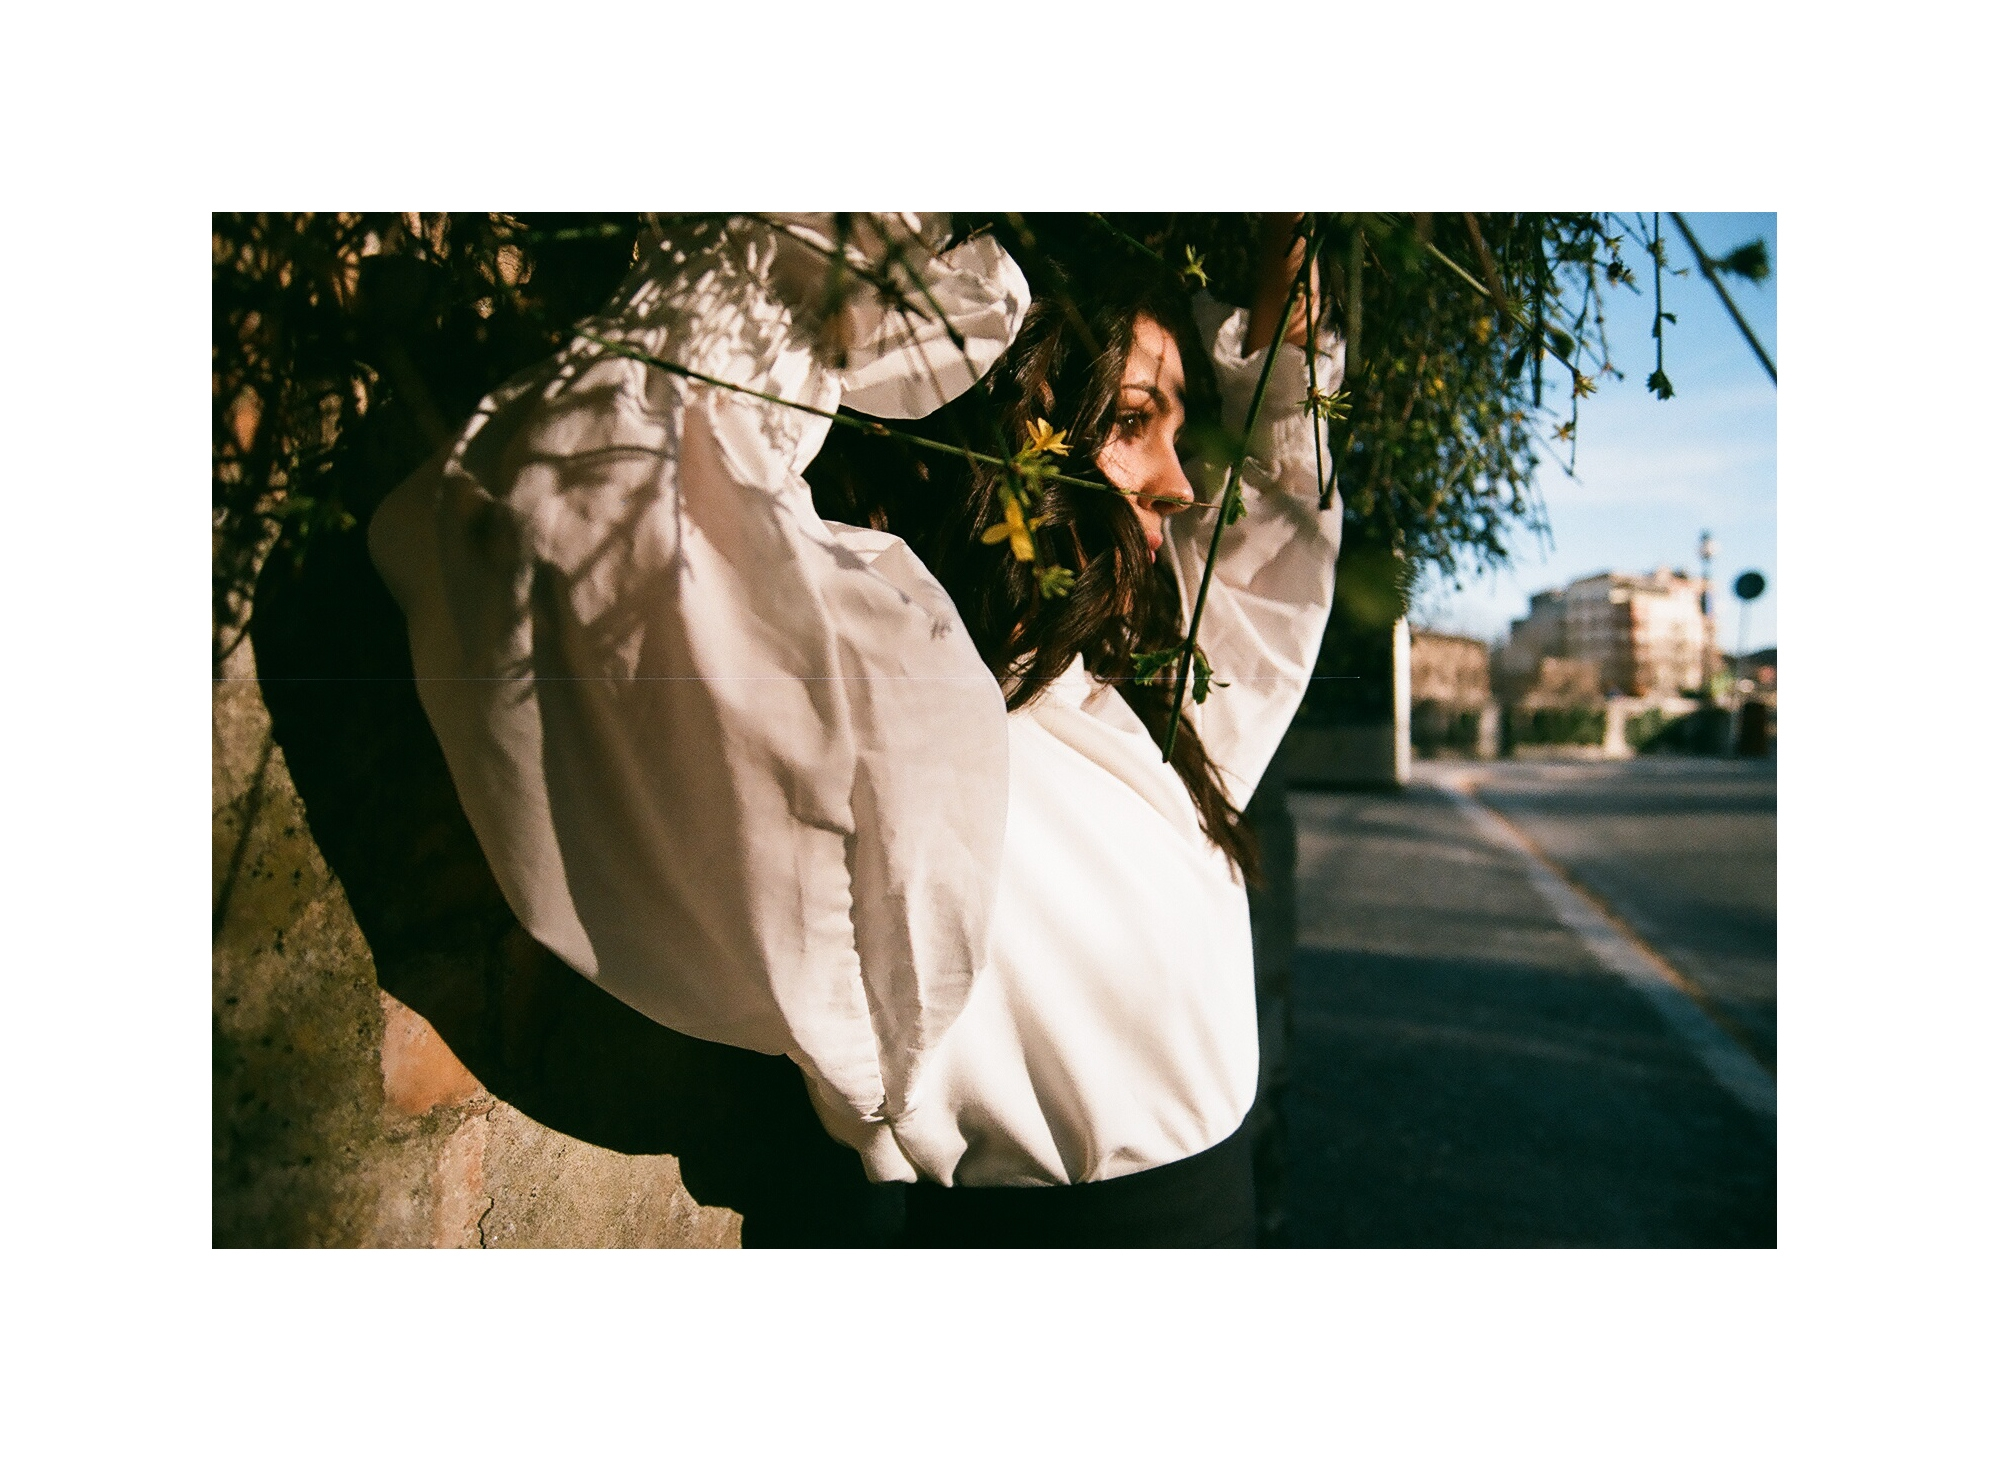 Beauty Springtime Roberta Grego - robertagregorace | ello